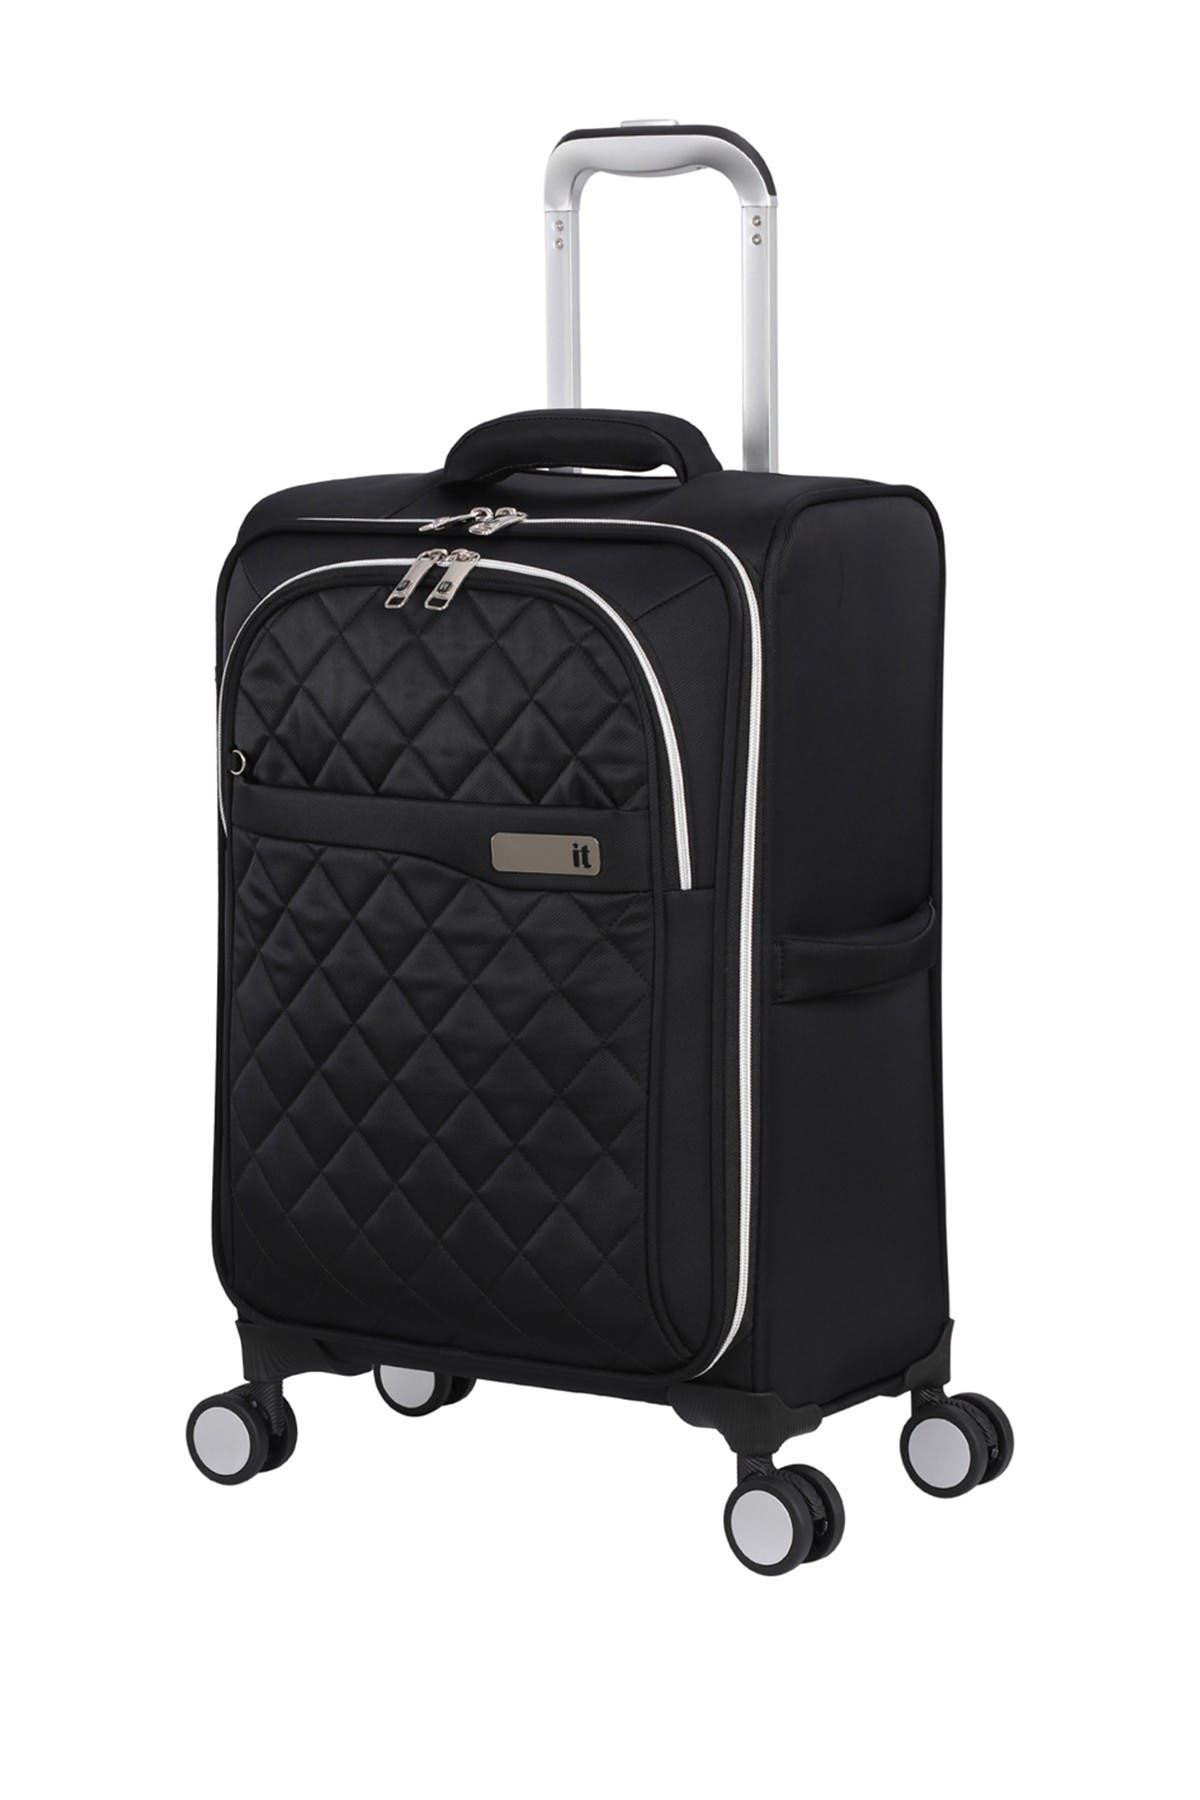 "Image of it luggage Admire 22"" Softside Spinner Luggage"